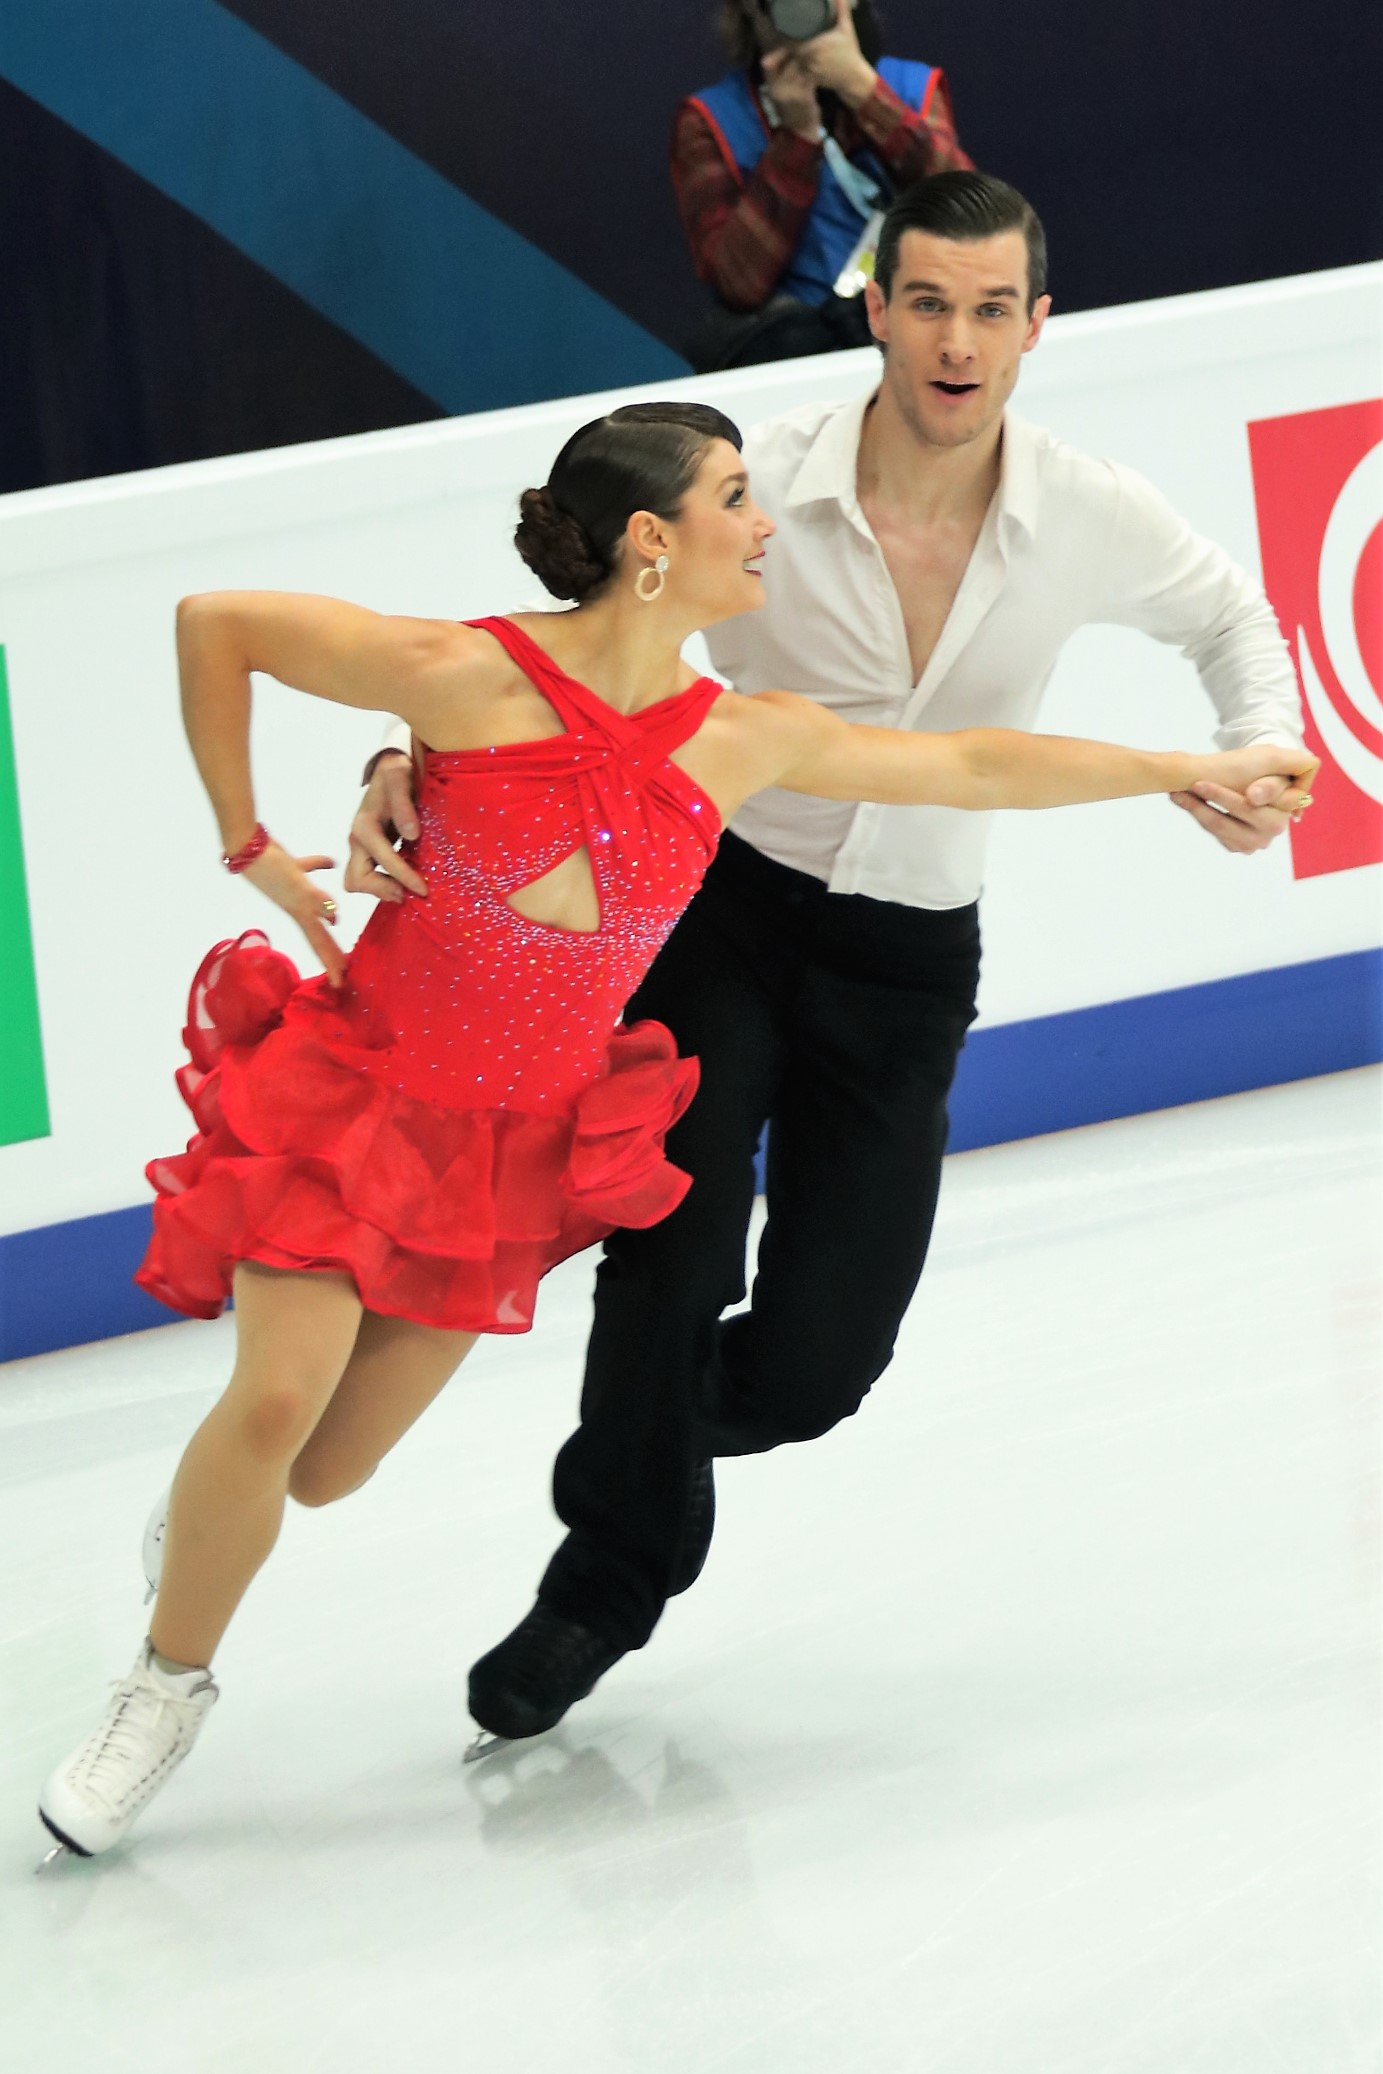 Kanada Ice Dancing dating kova rakkaus Dating neuvoja